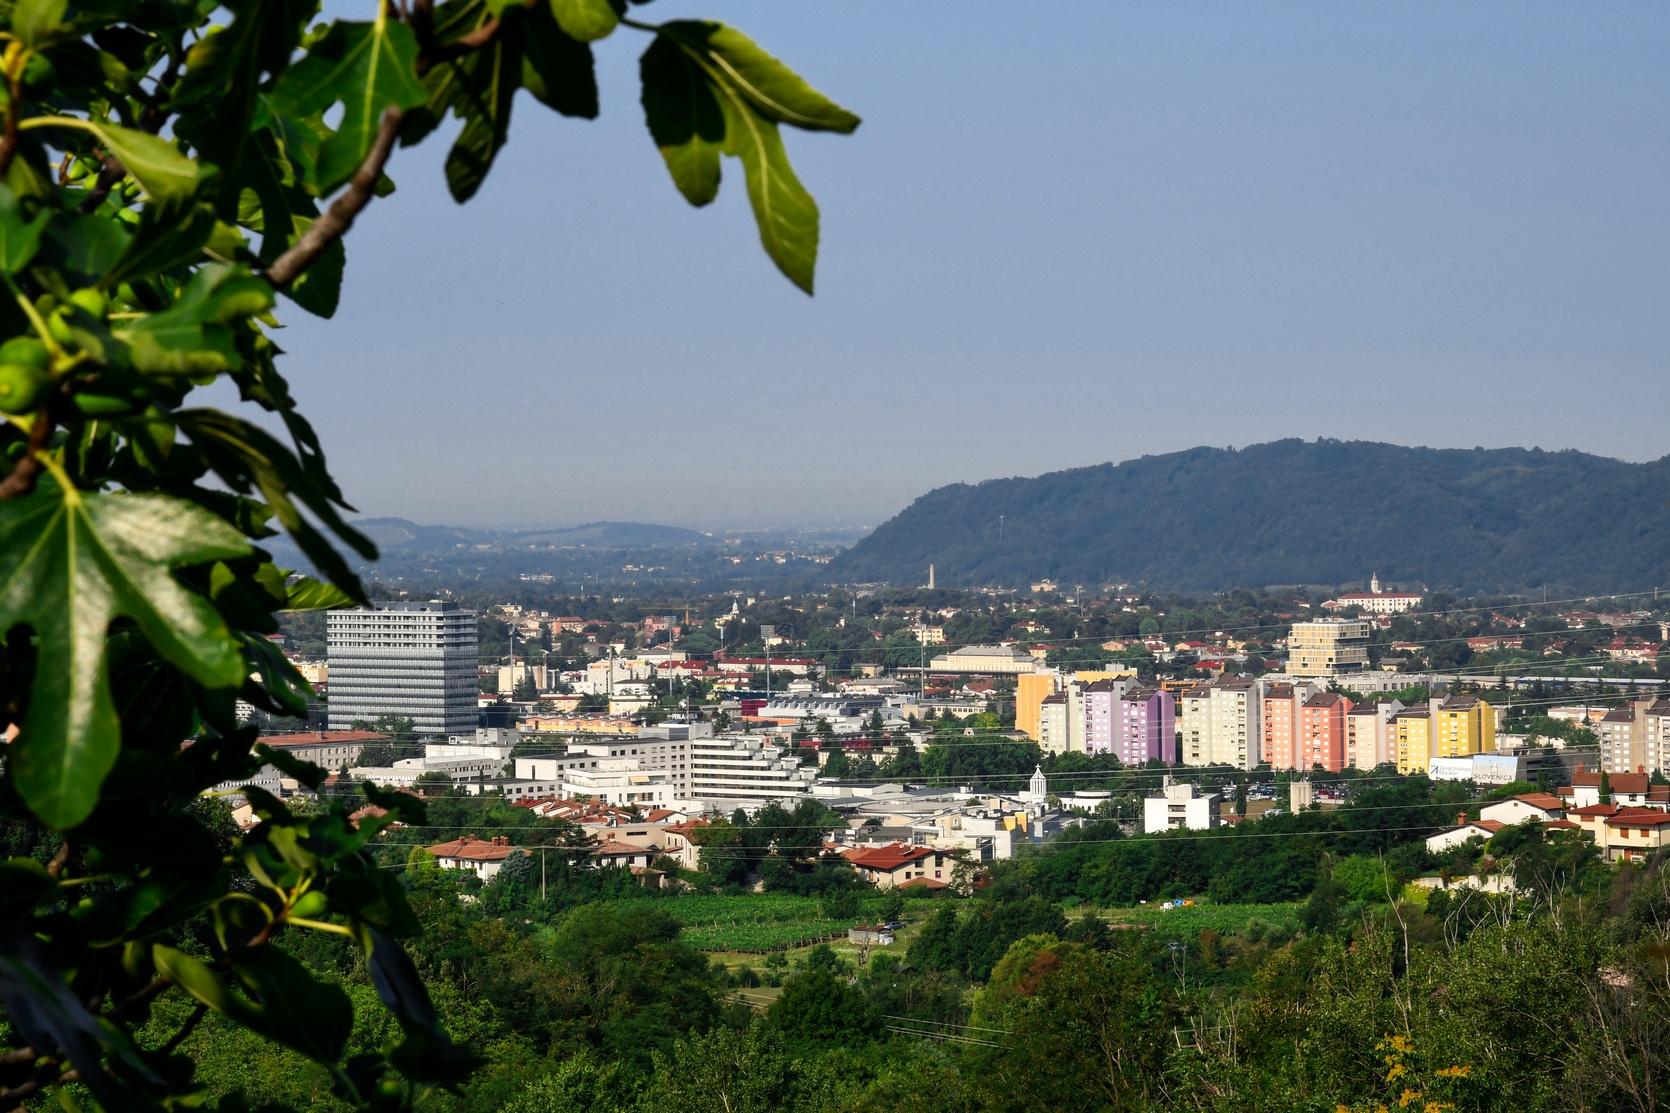 OKOLICA-Pogled na Novo Gorico, hrib Kekec